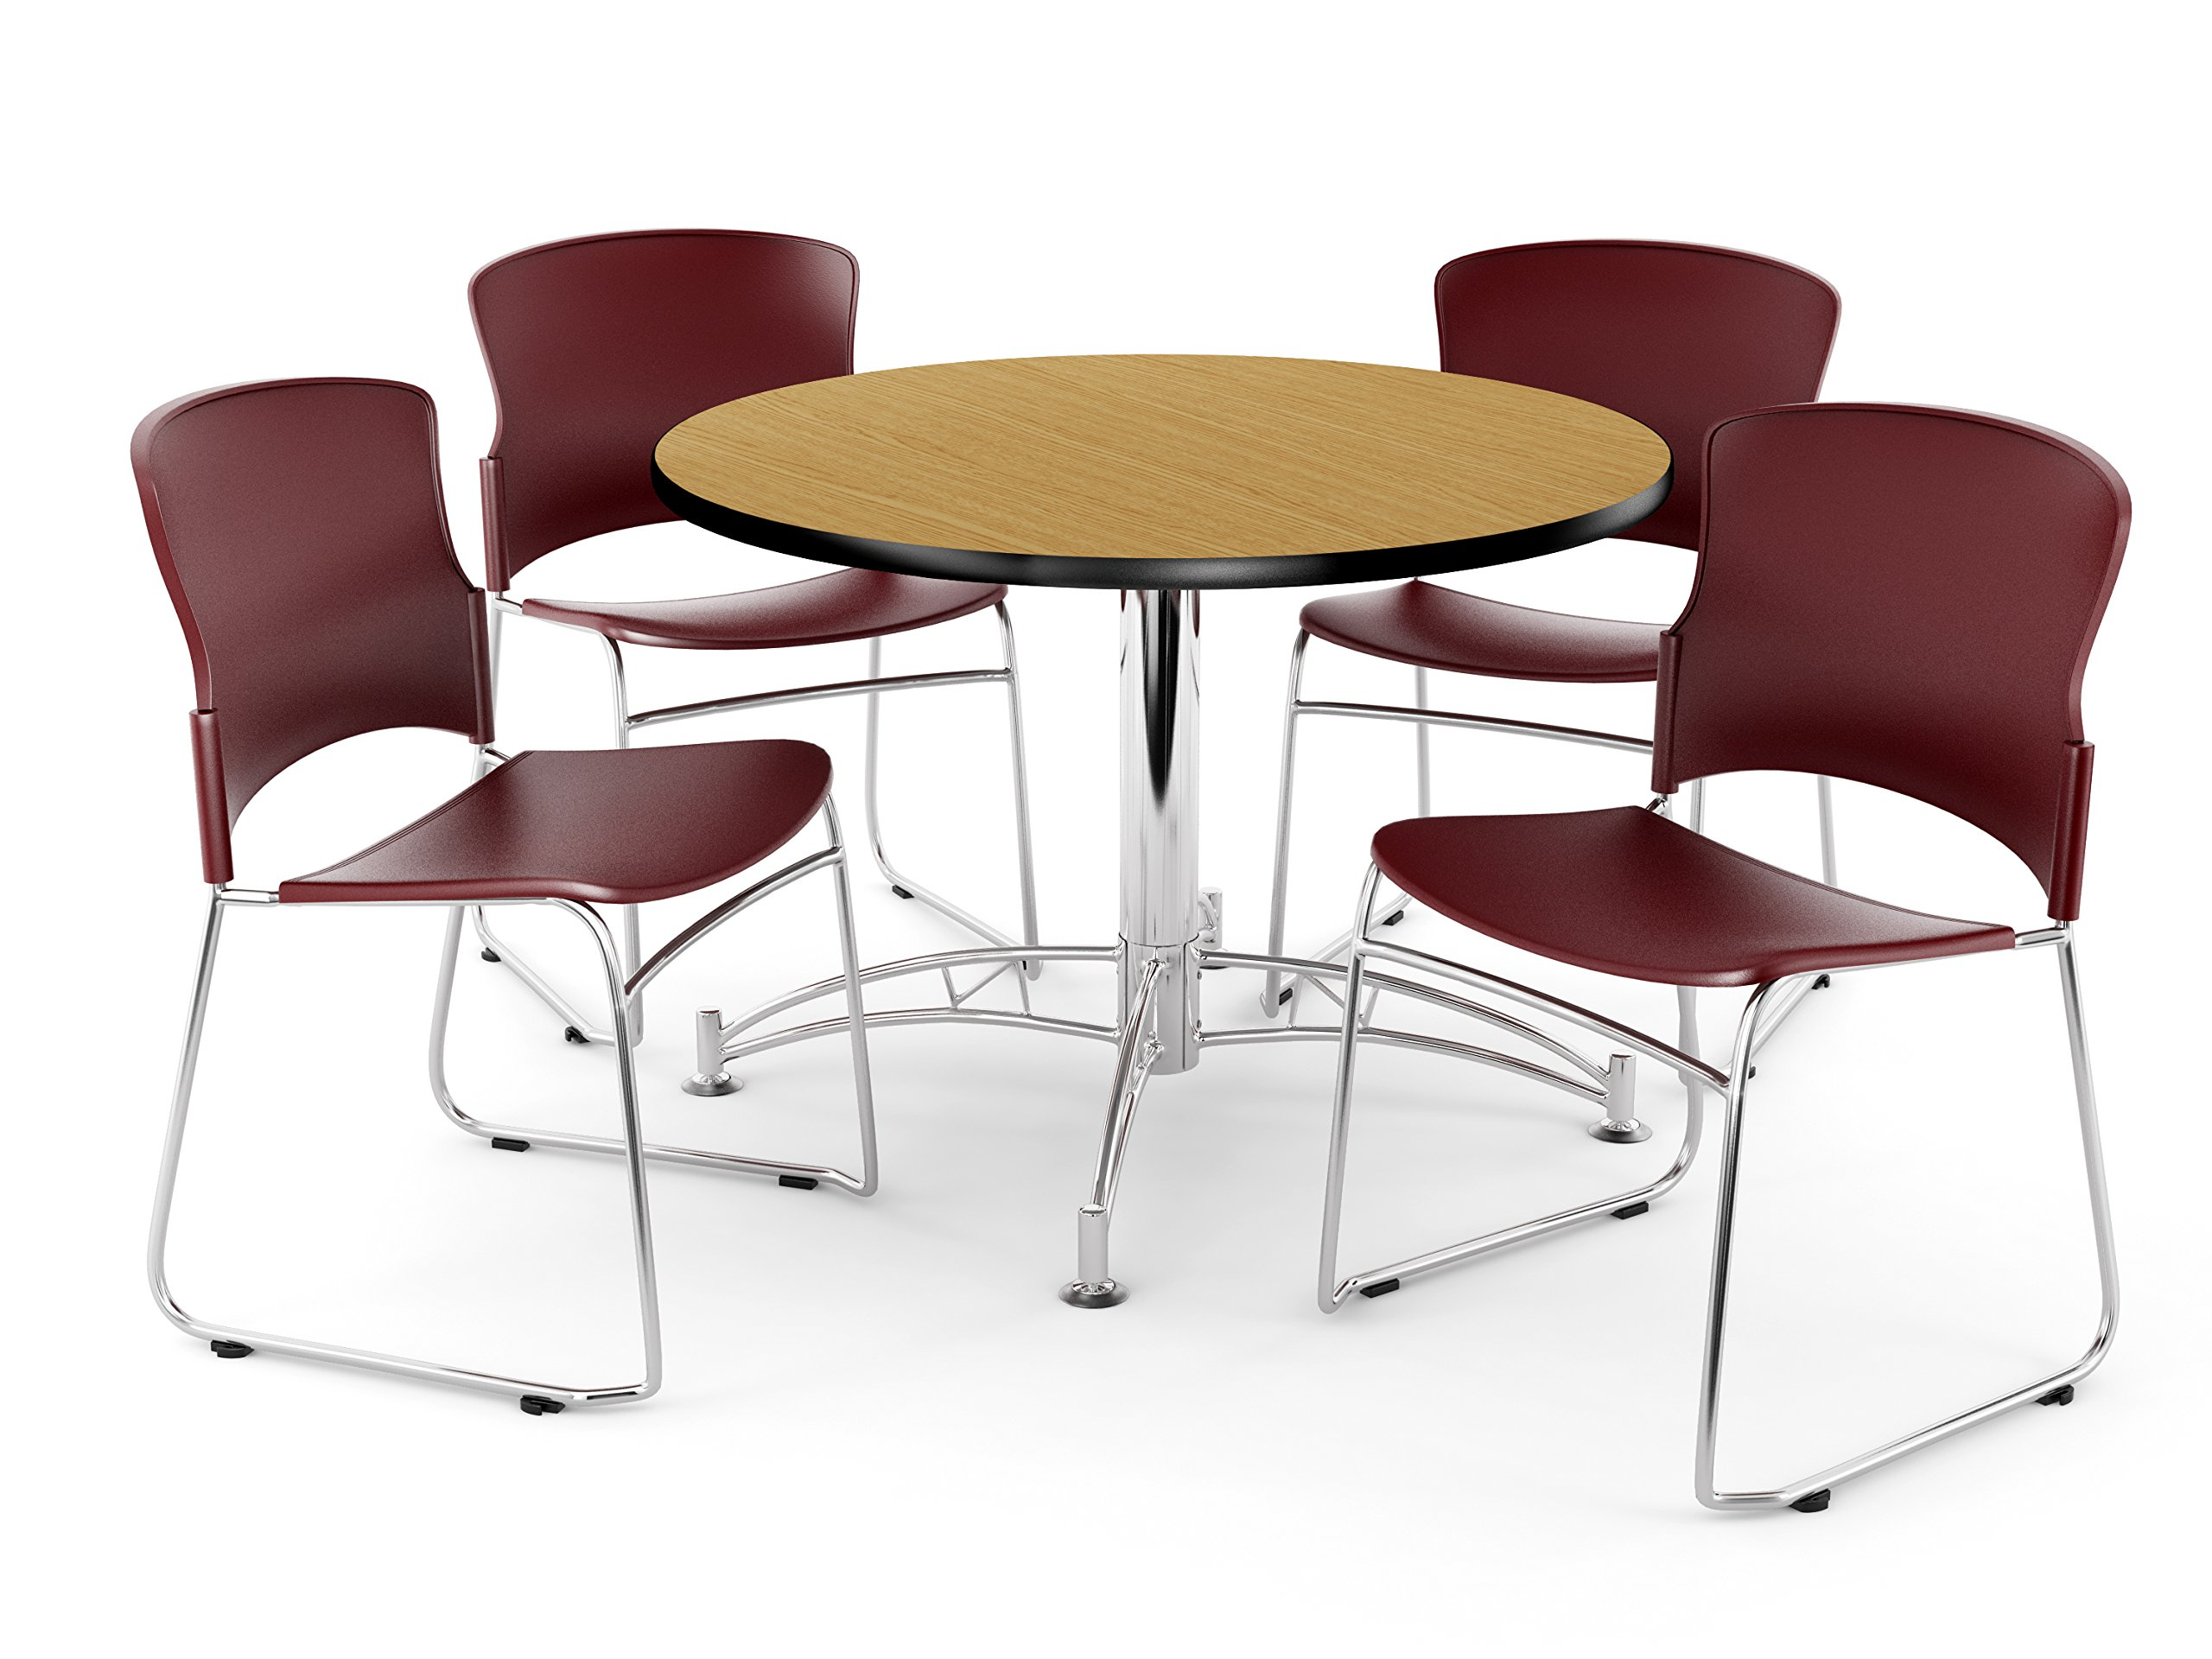 OFM PKG-BRK-10-0015 Breakroom Package, Oak Table/Wine Chair